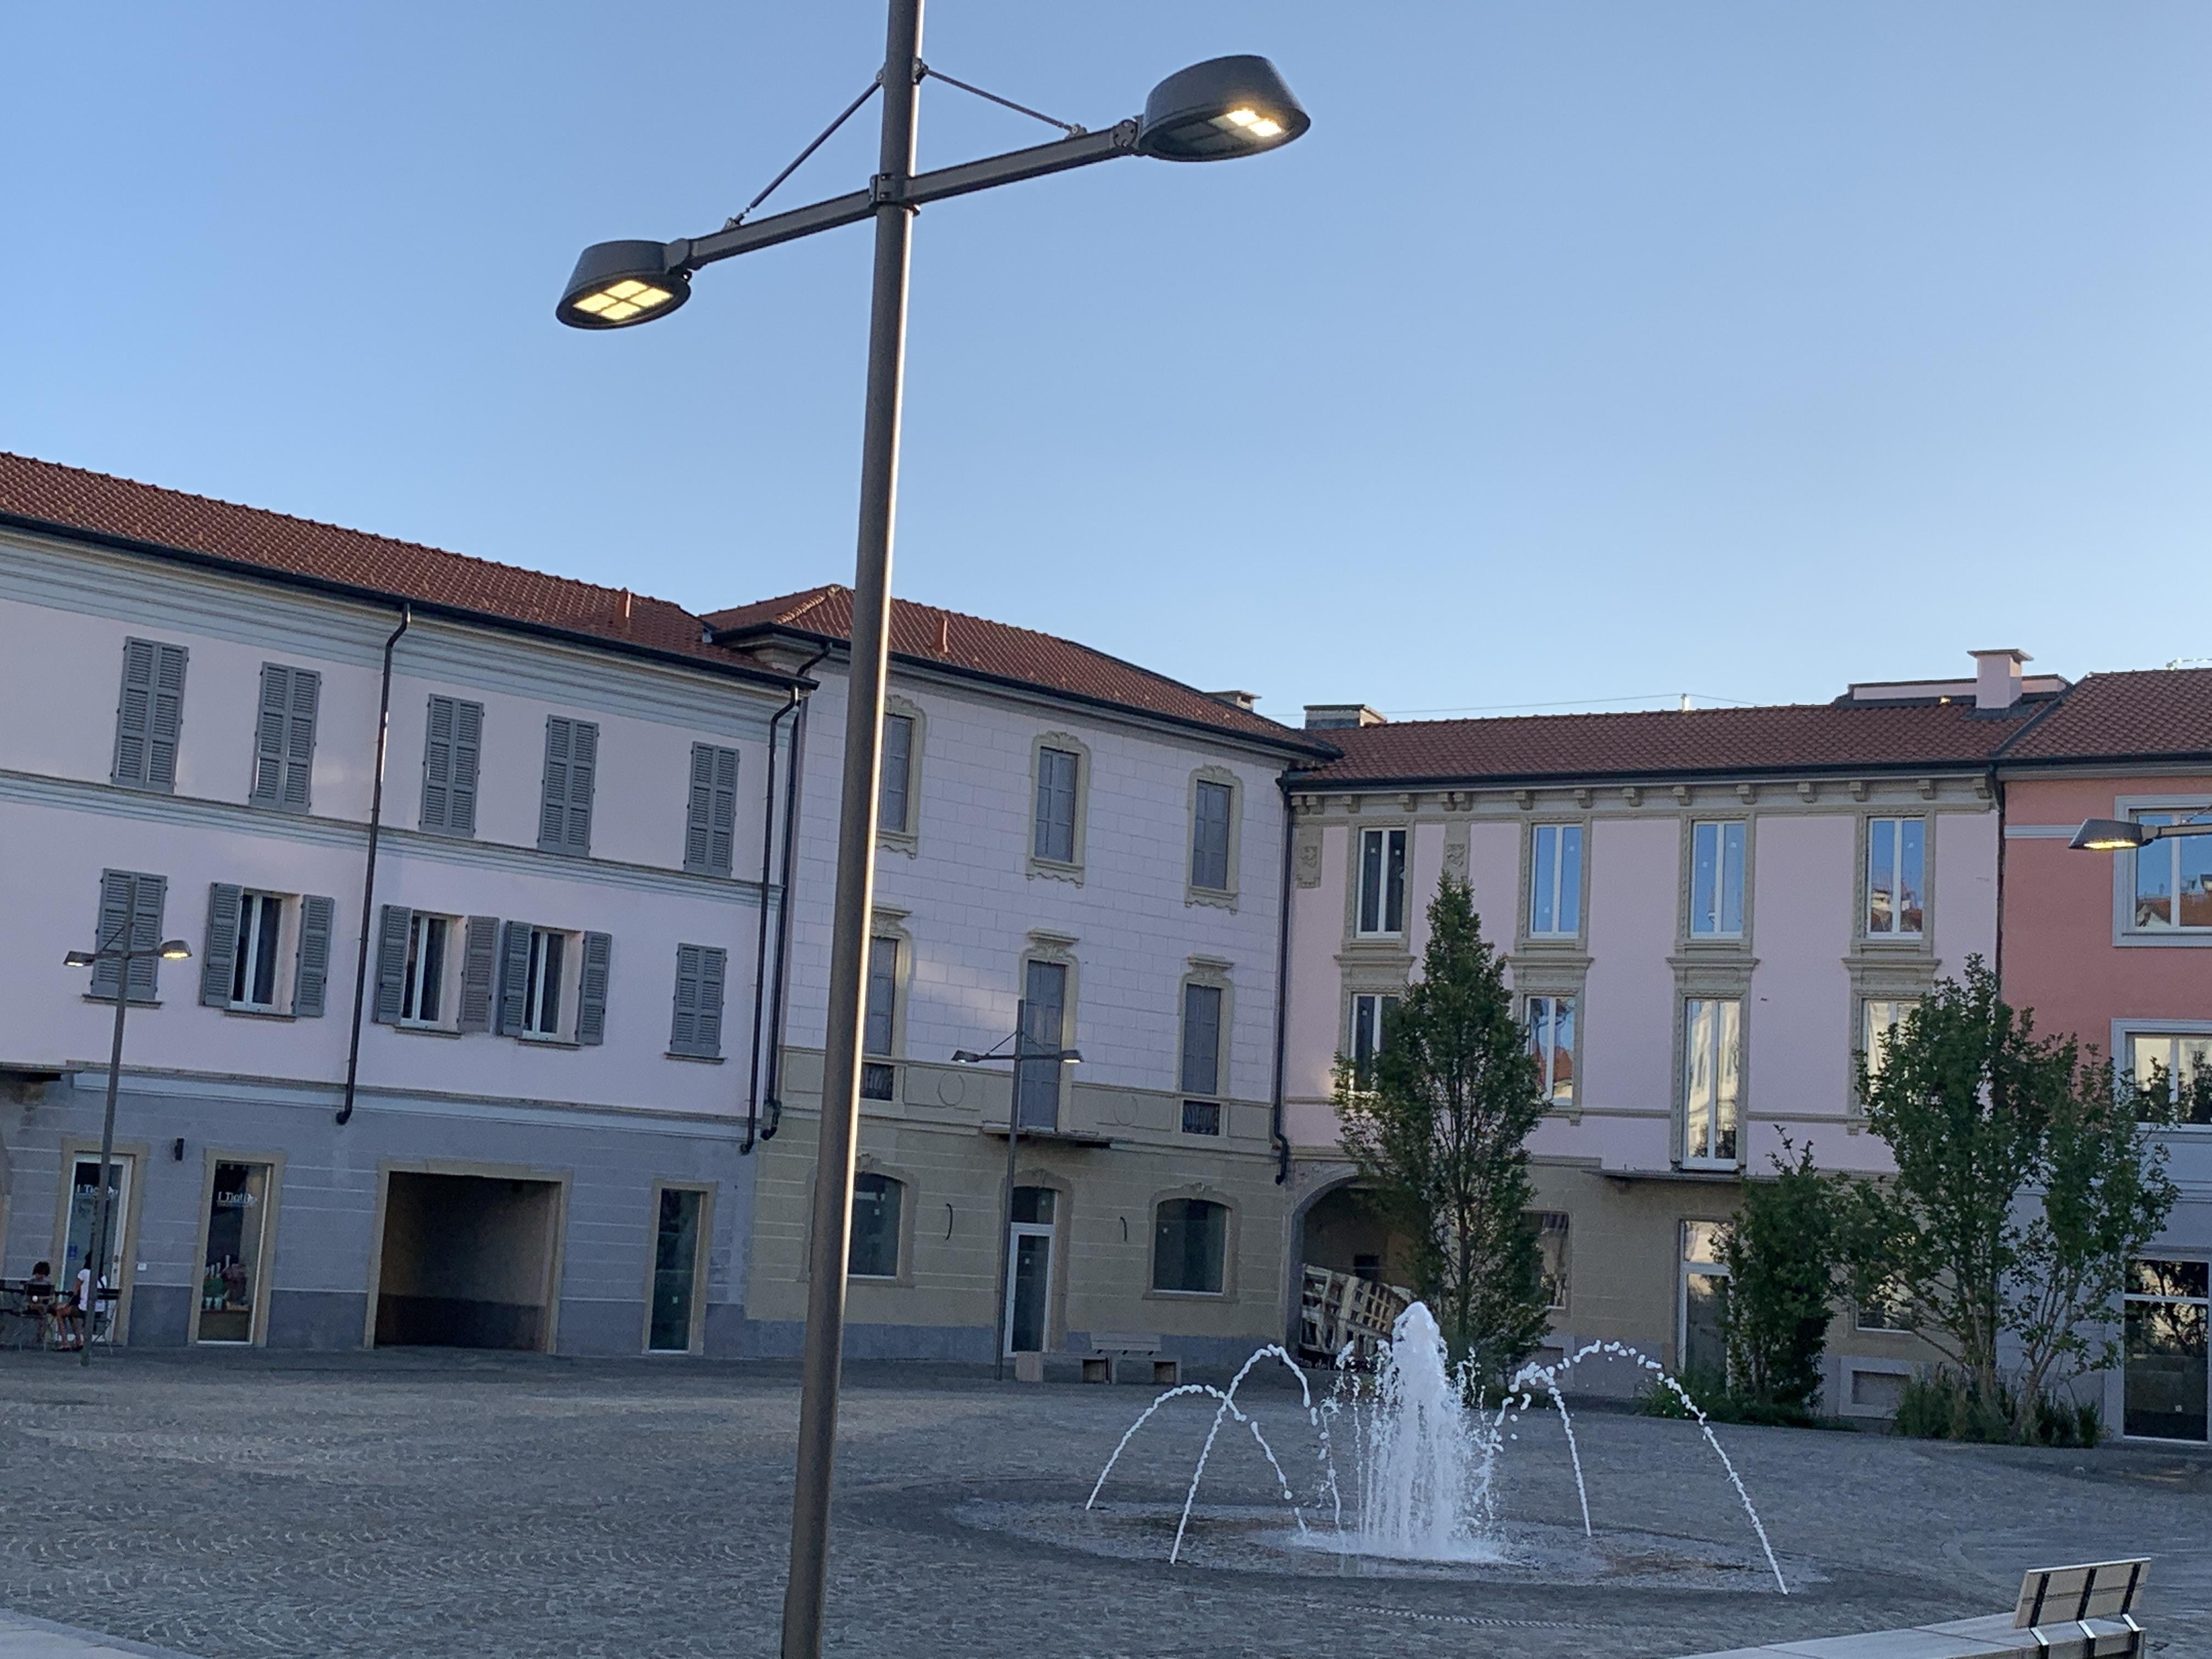 busto piazza vittorio emanuele